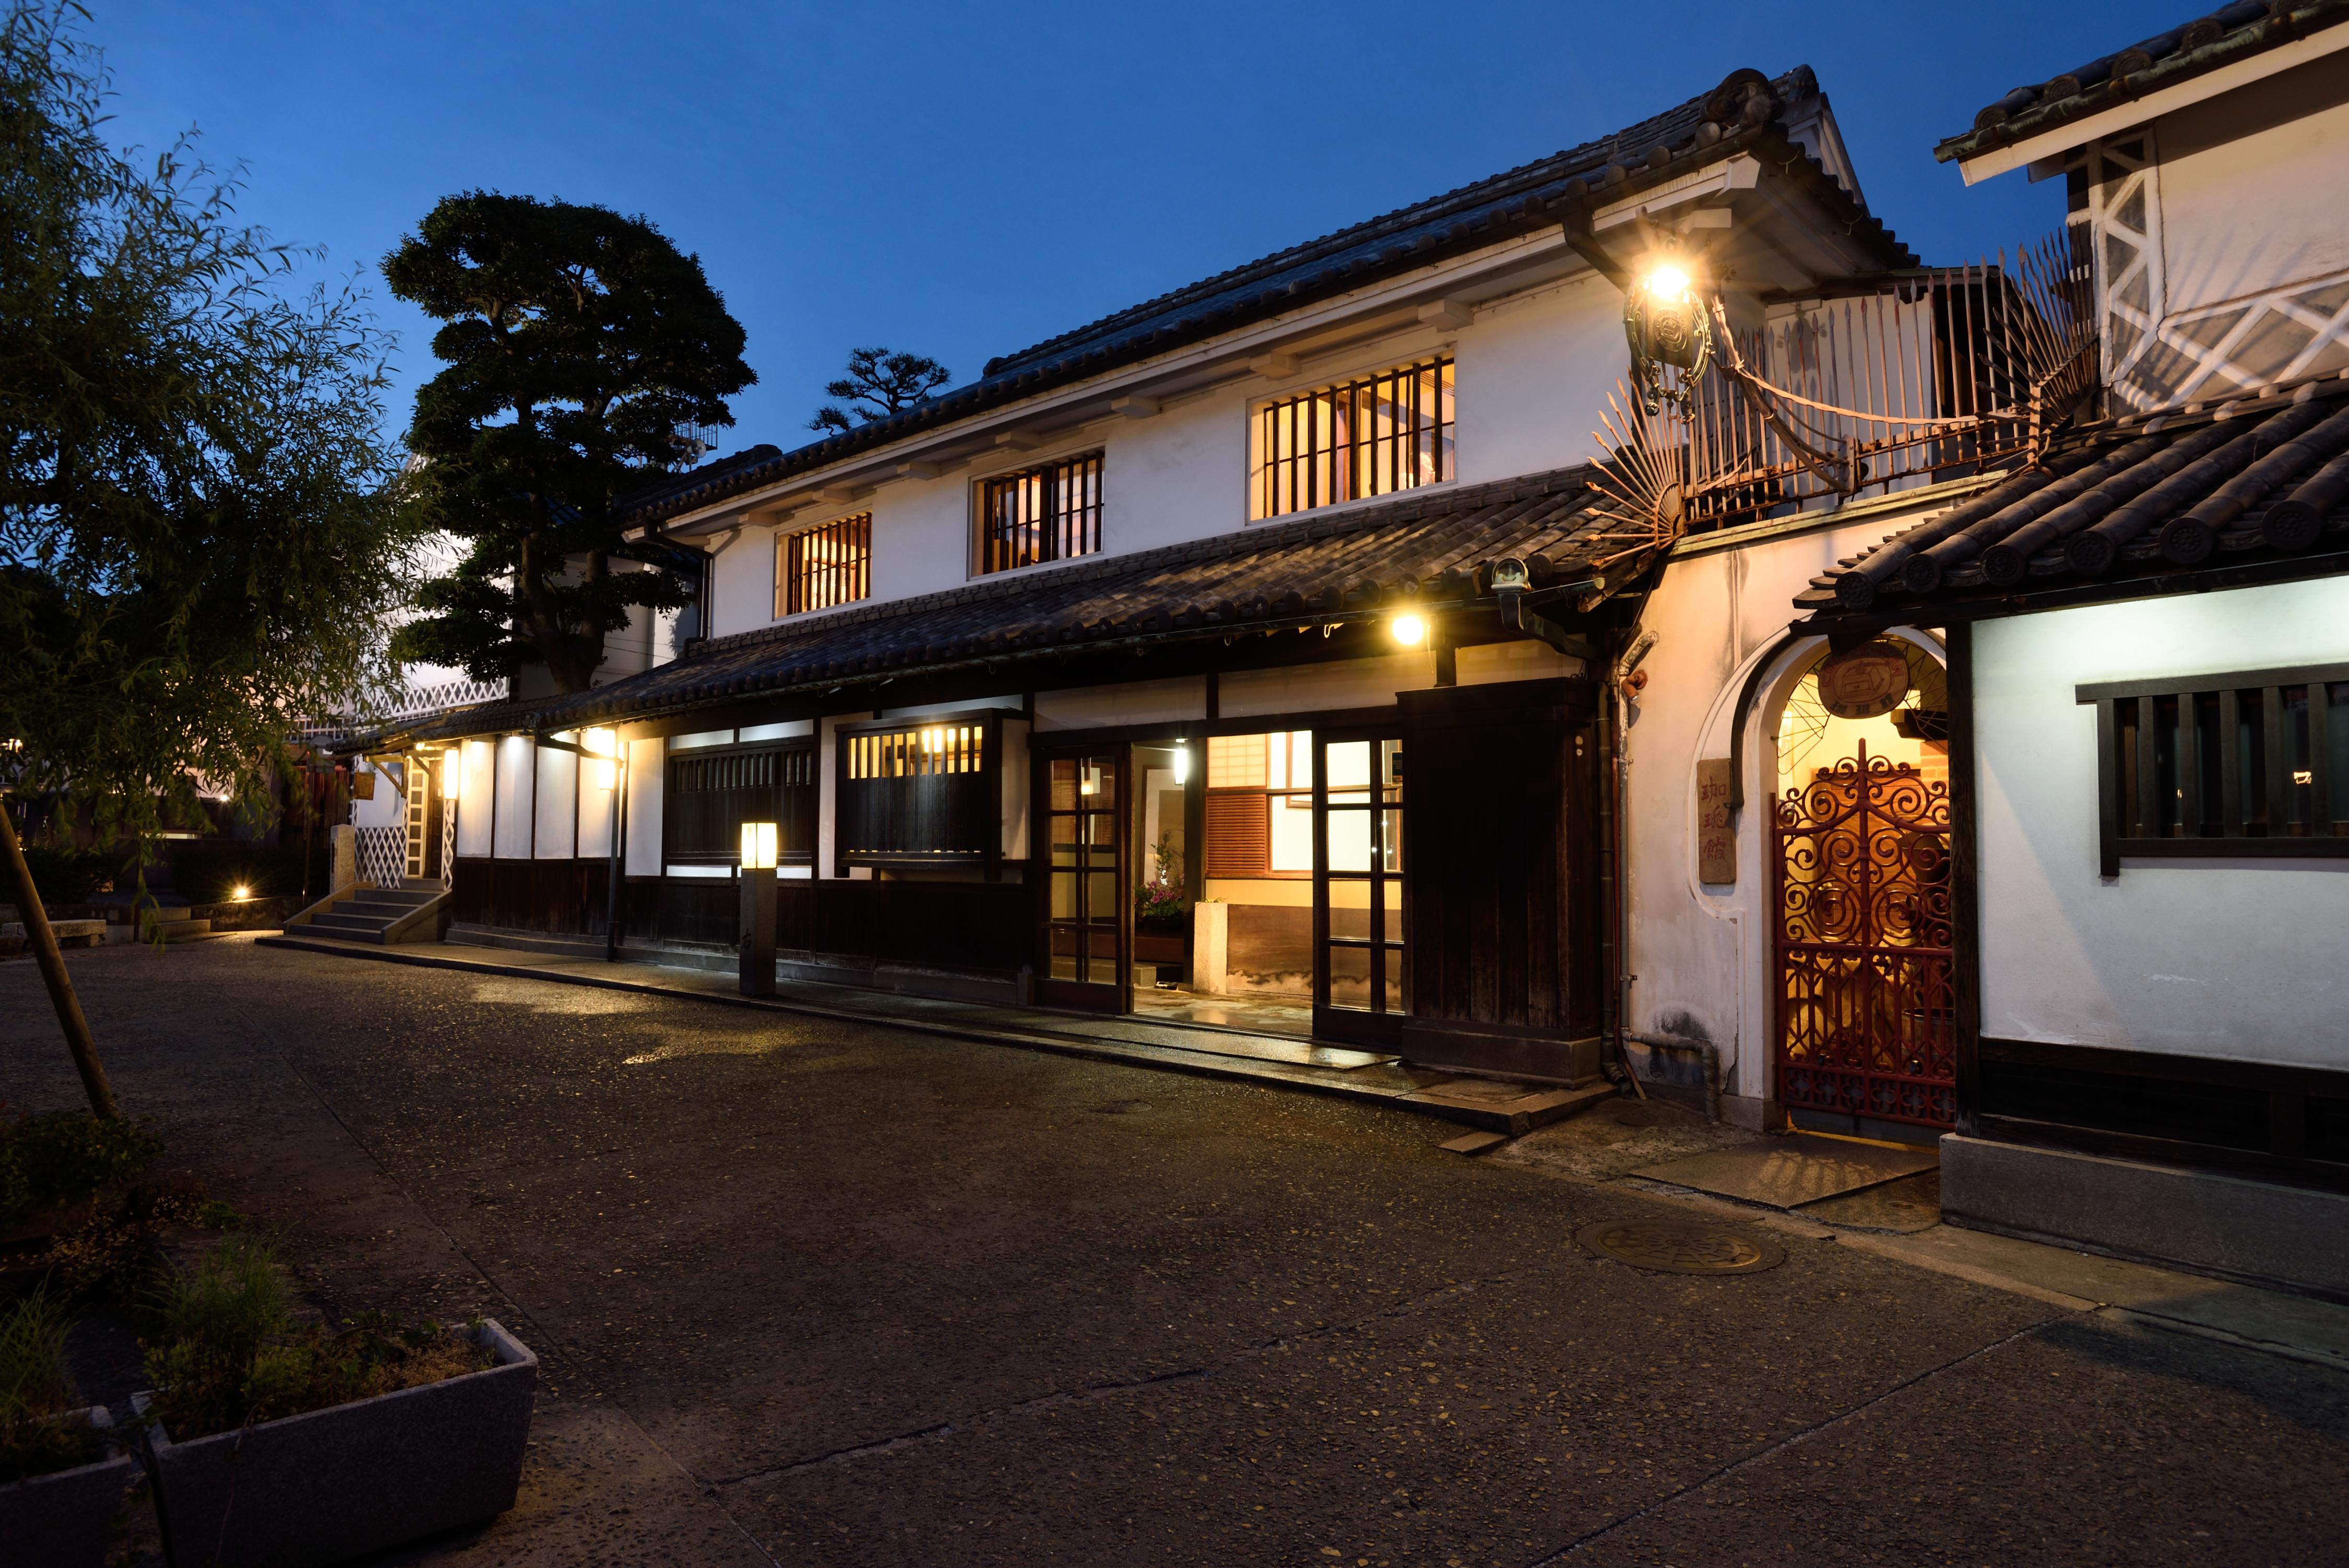 The Ryokan Kurashiki is a traditional Japanese guest house